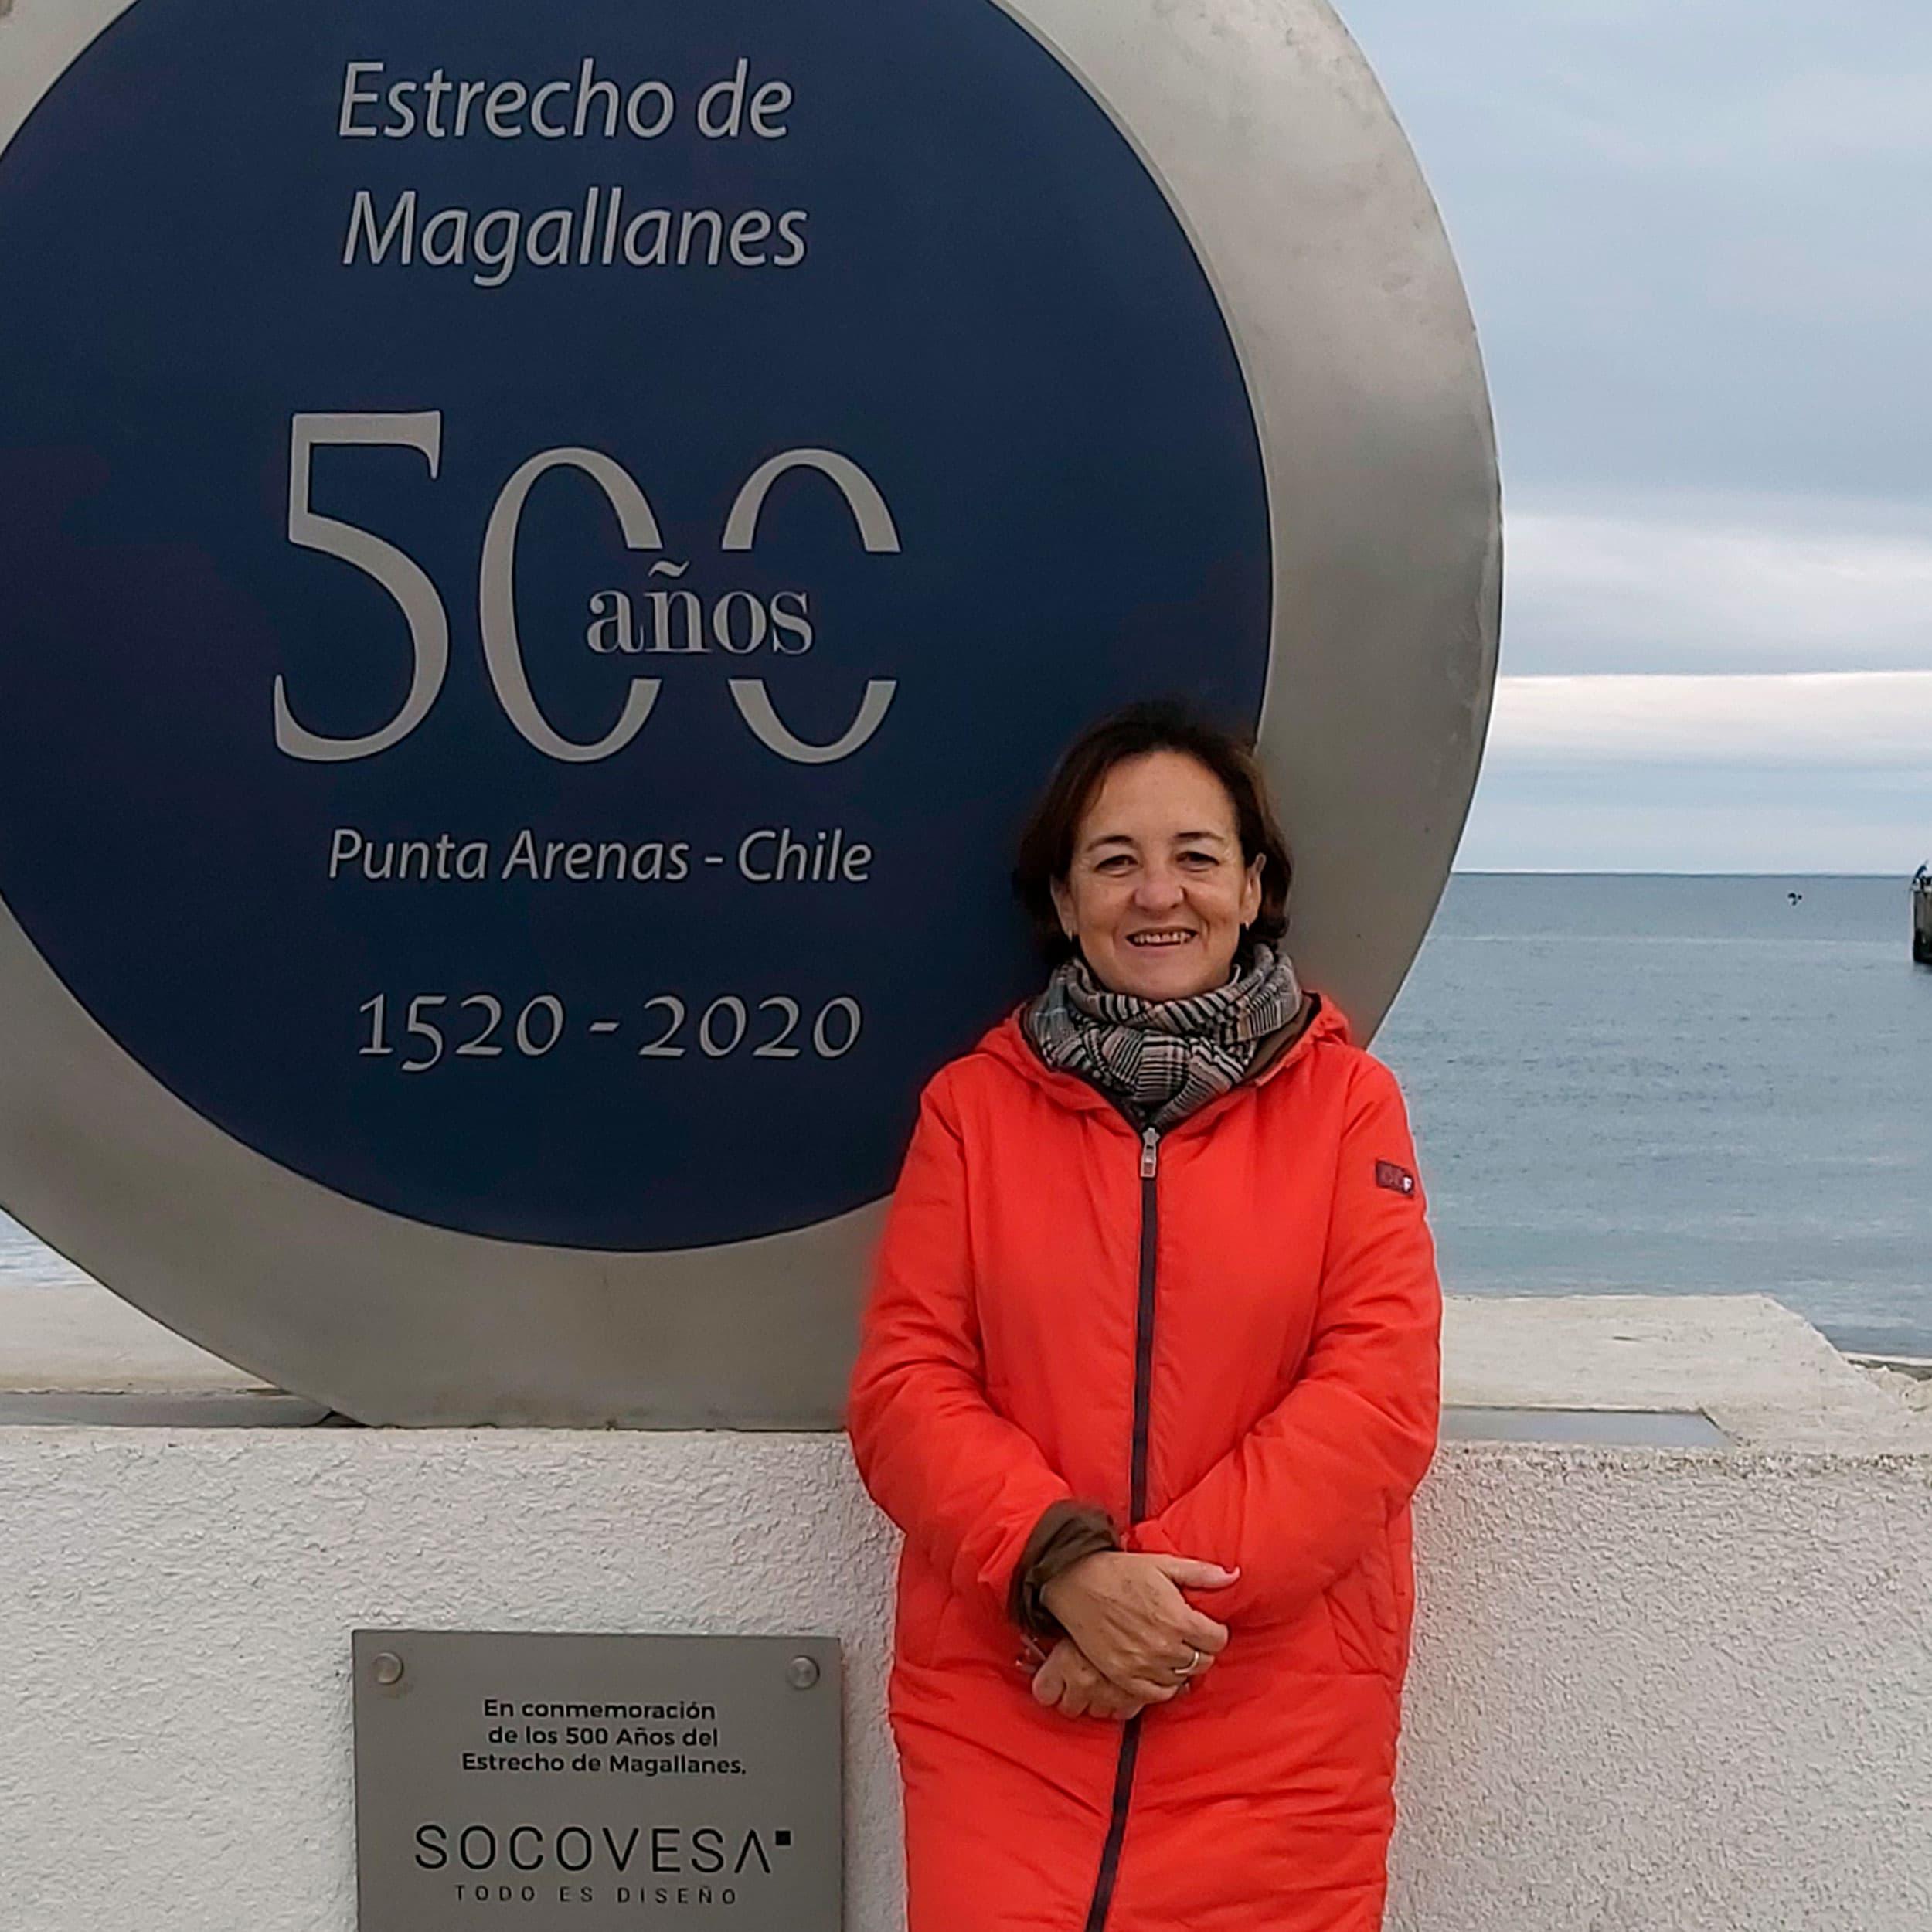 VIAJES EUROTRIP - viajes a medida personalizados en Donostia - San Sebastian